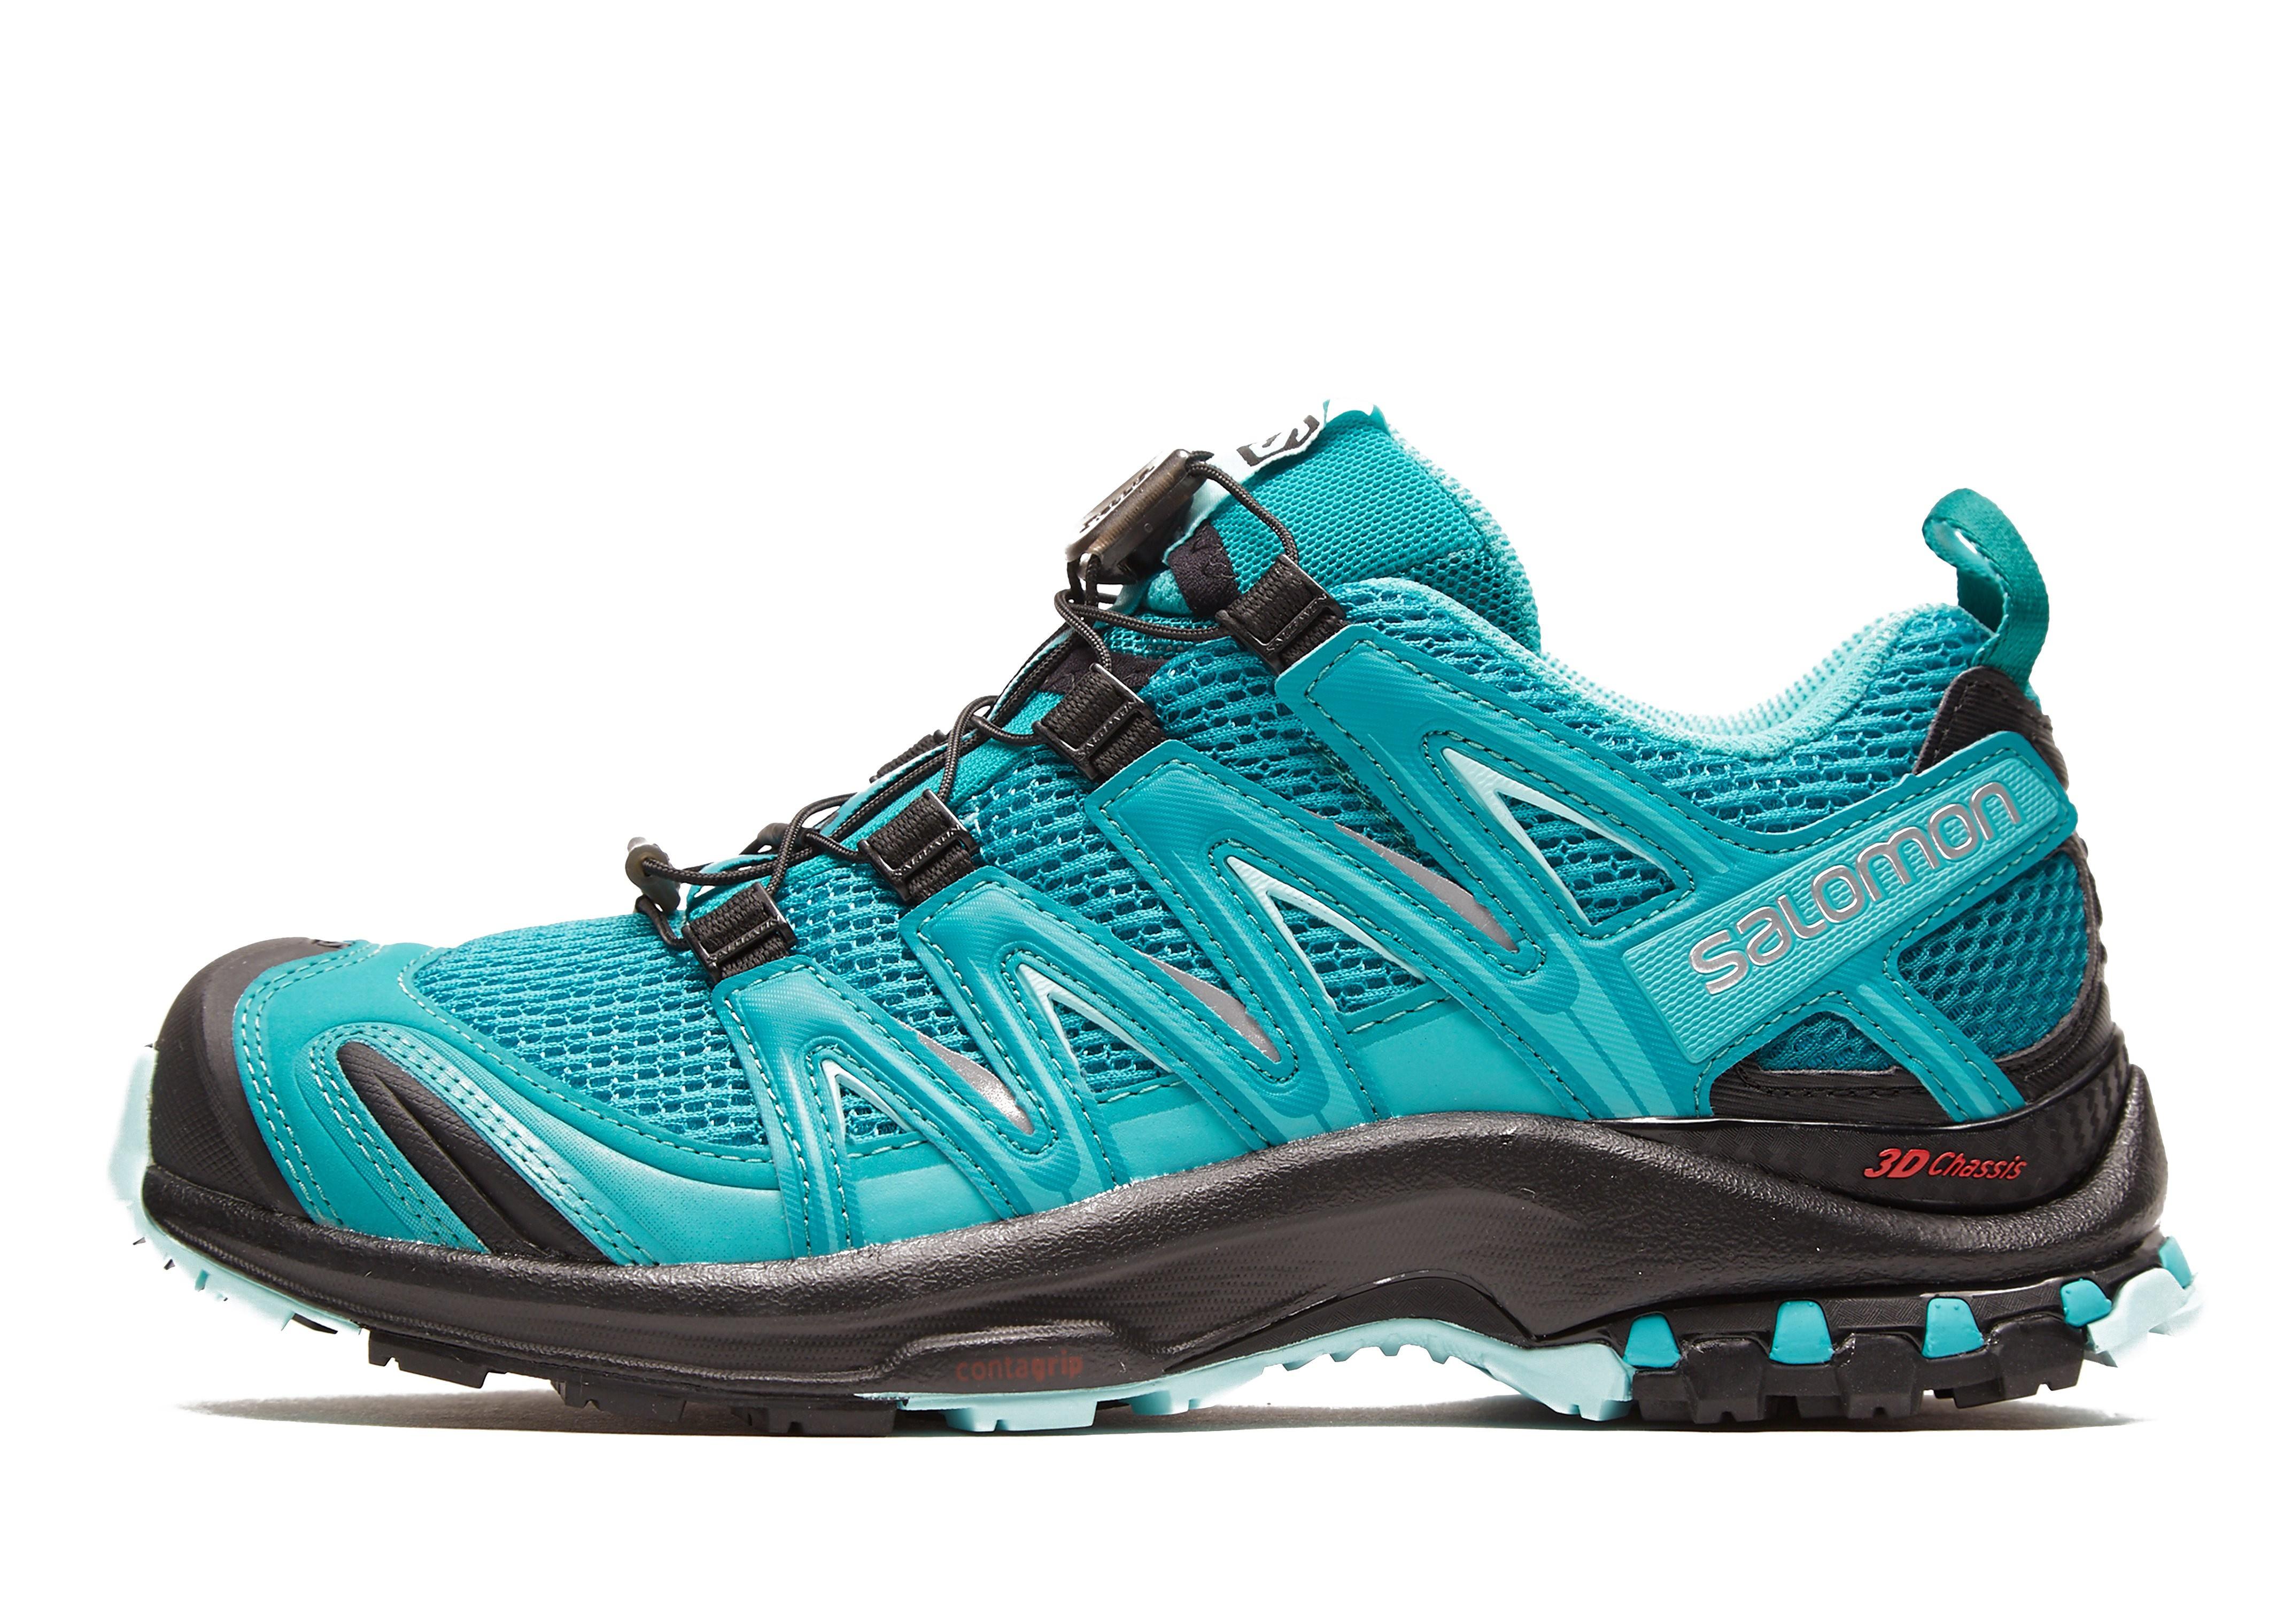 Salomon XA Pro 3D Trail Running Shoes Women's